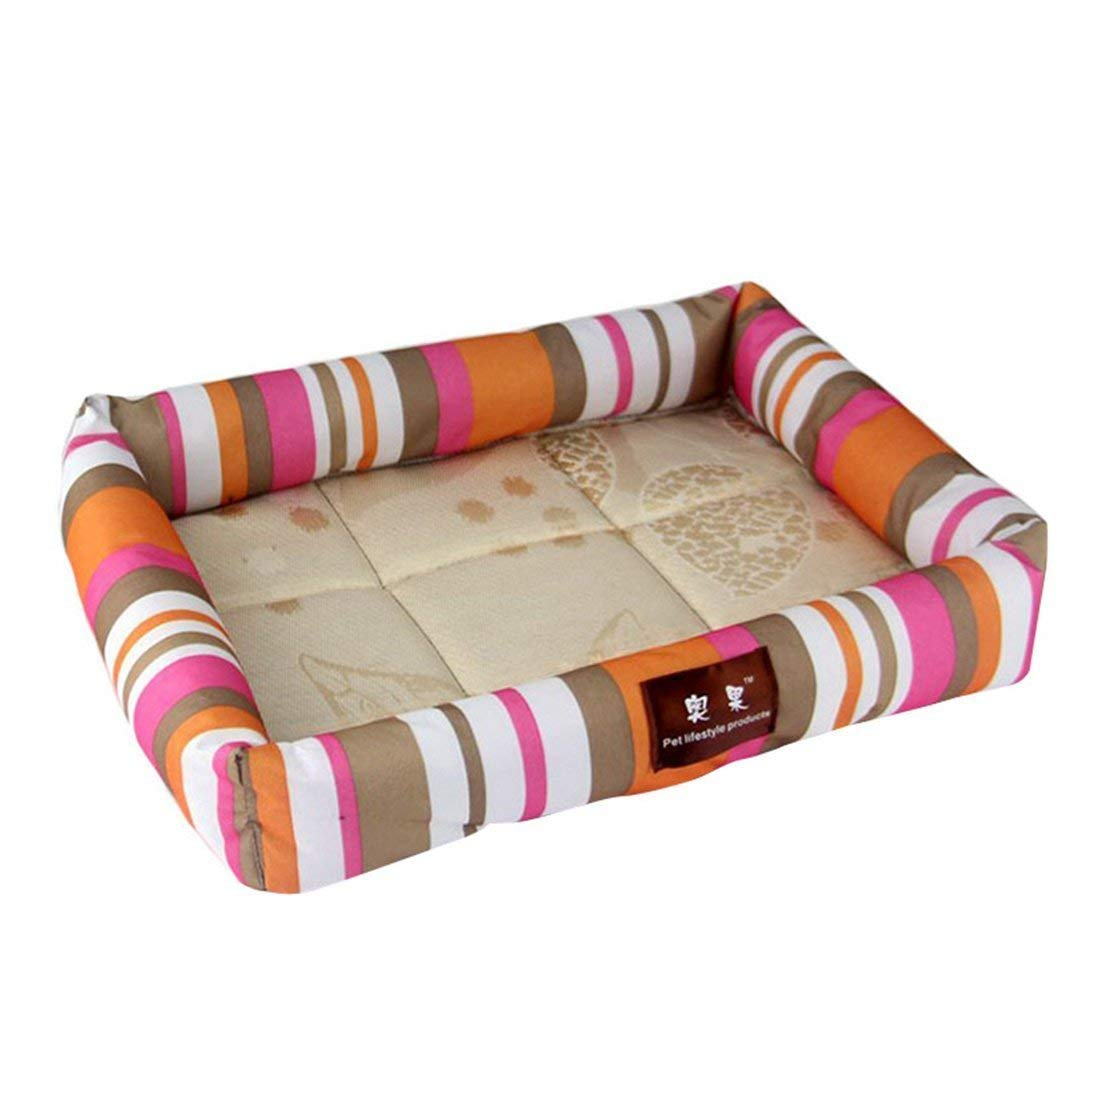 FERZA petsuppliesmisc Cushion pink and Pet Bed Blanket Summer Dog Bed Pet Cooling Sleeping Mat Cat Bed orange XL